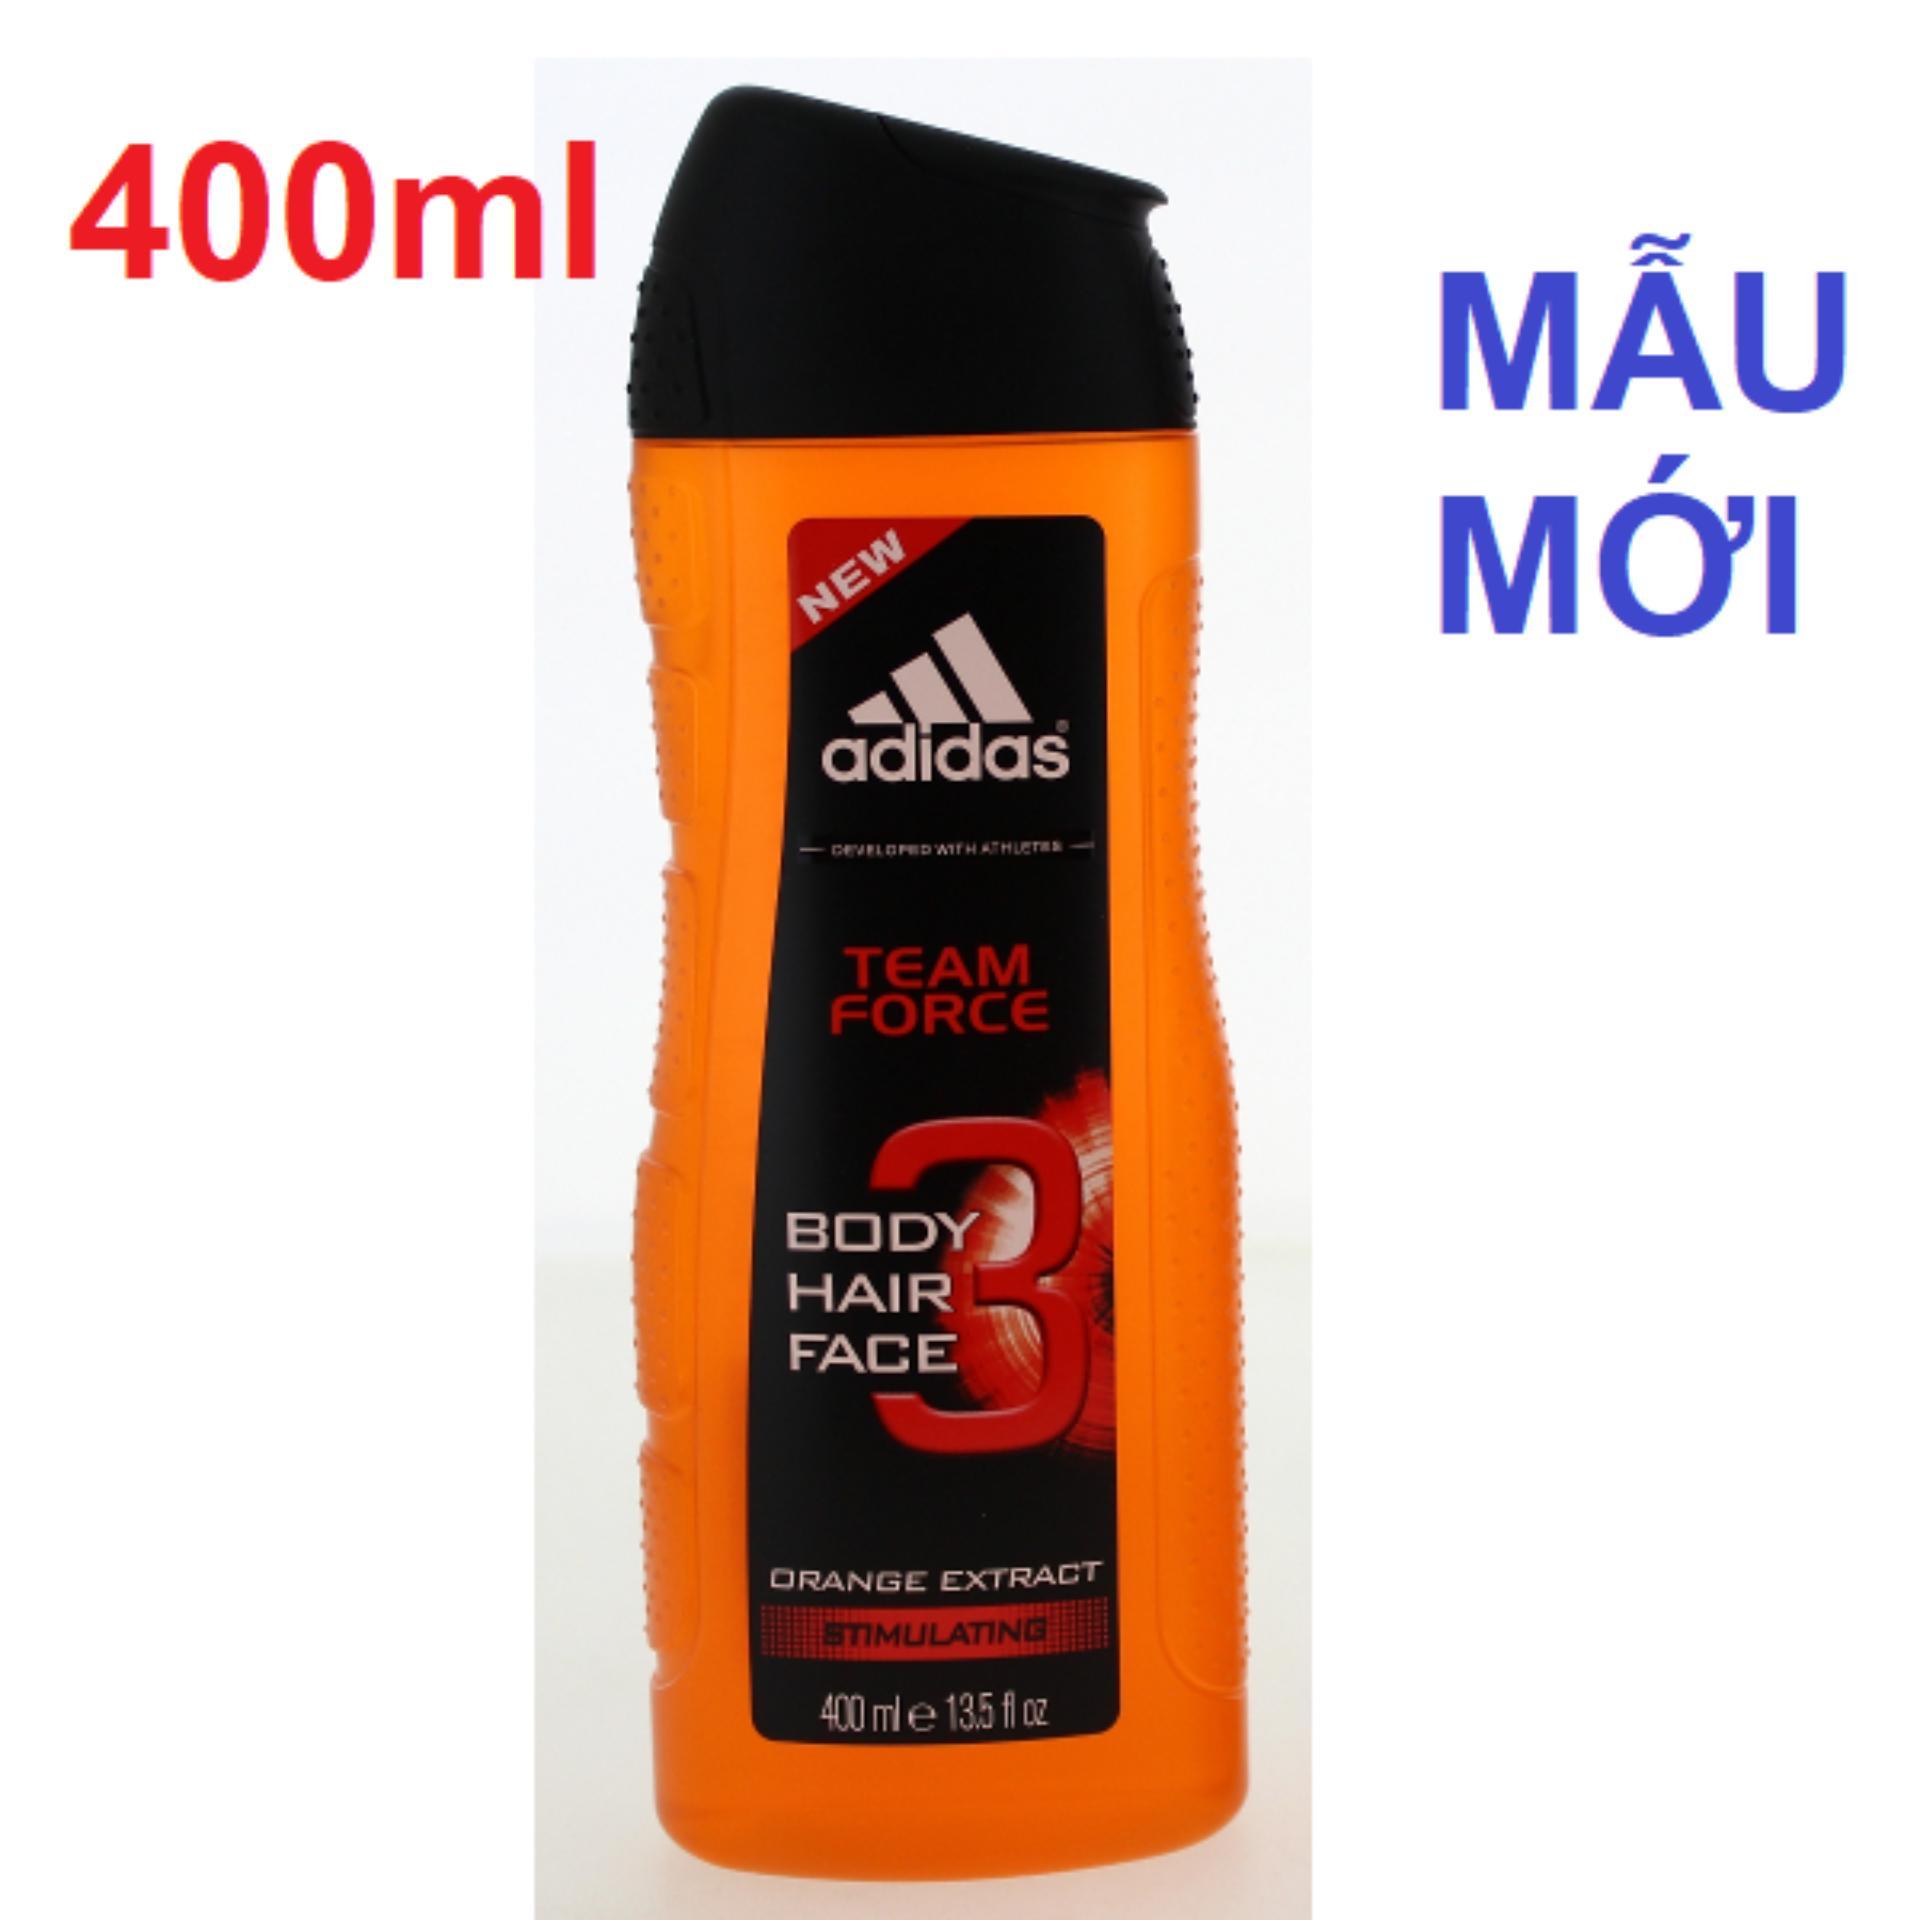 Sữa tắm gội rửa mặt 3 trong 1 cho nam 400ml Adidas 3 in 1 Team Force